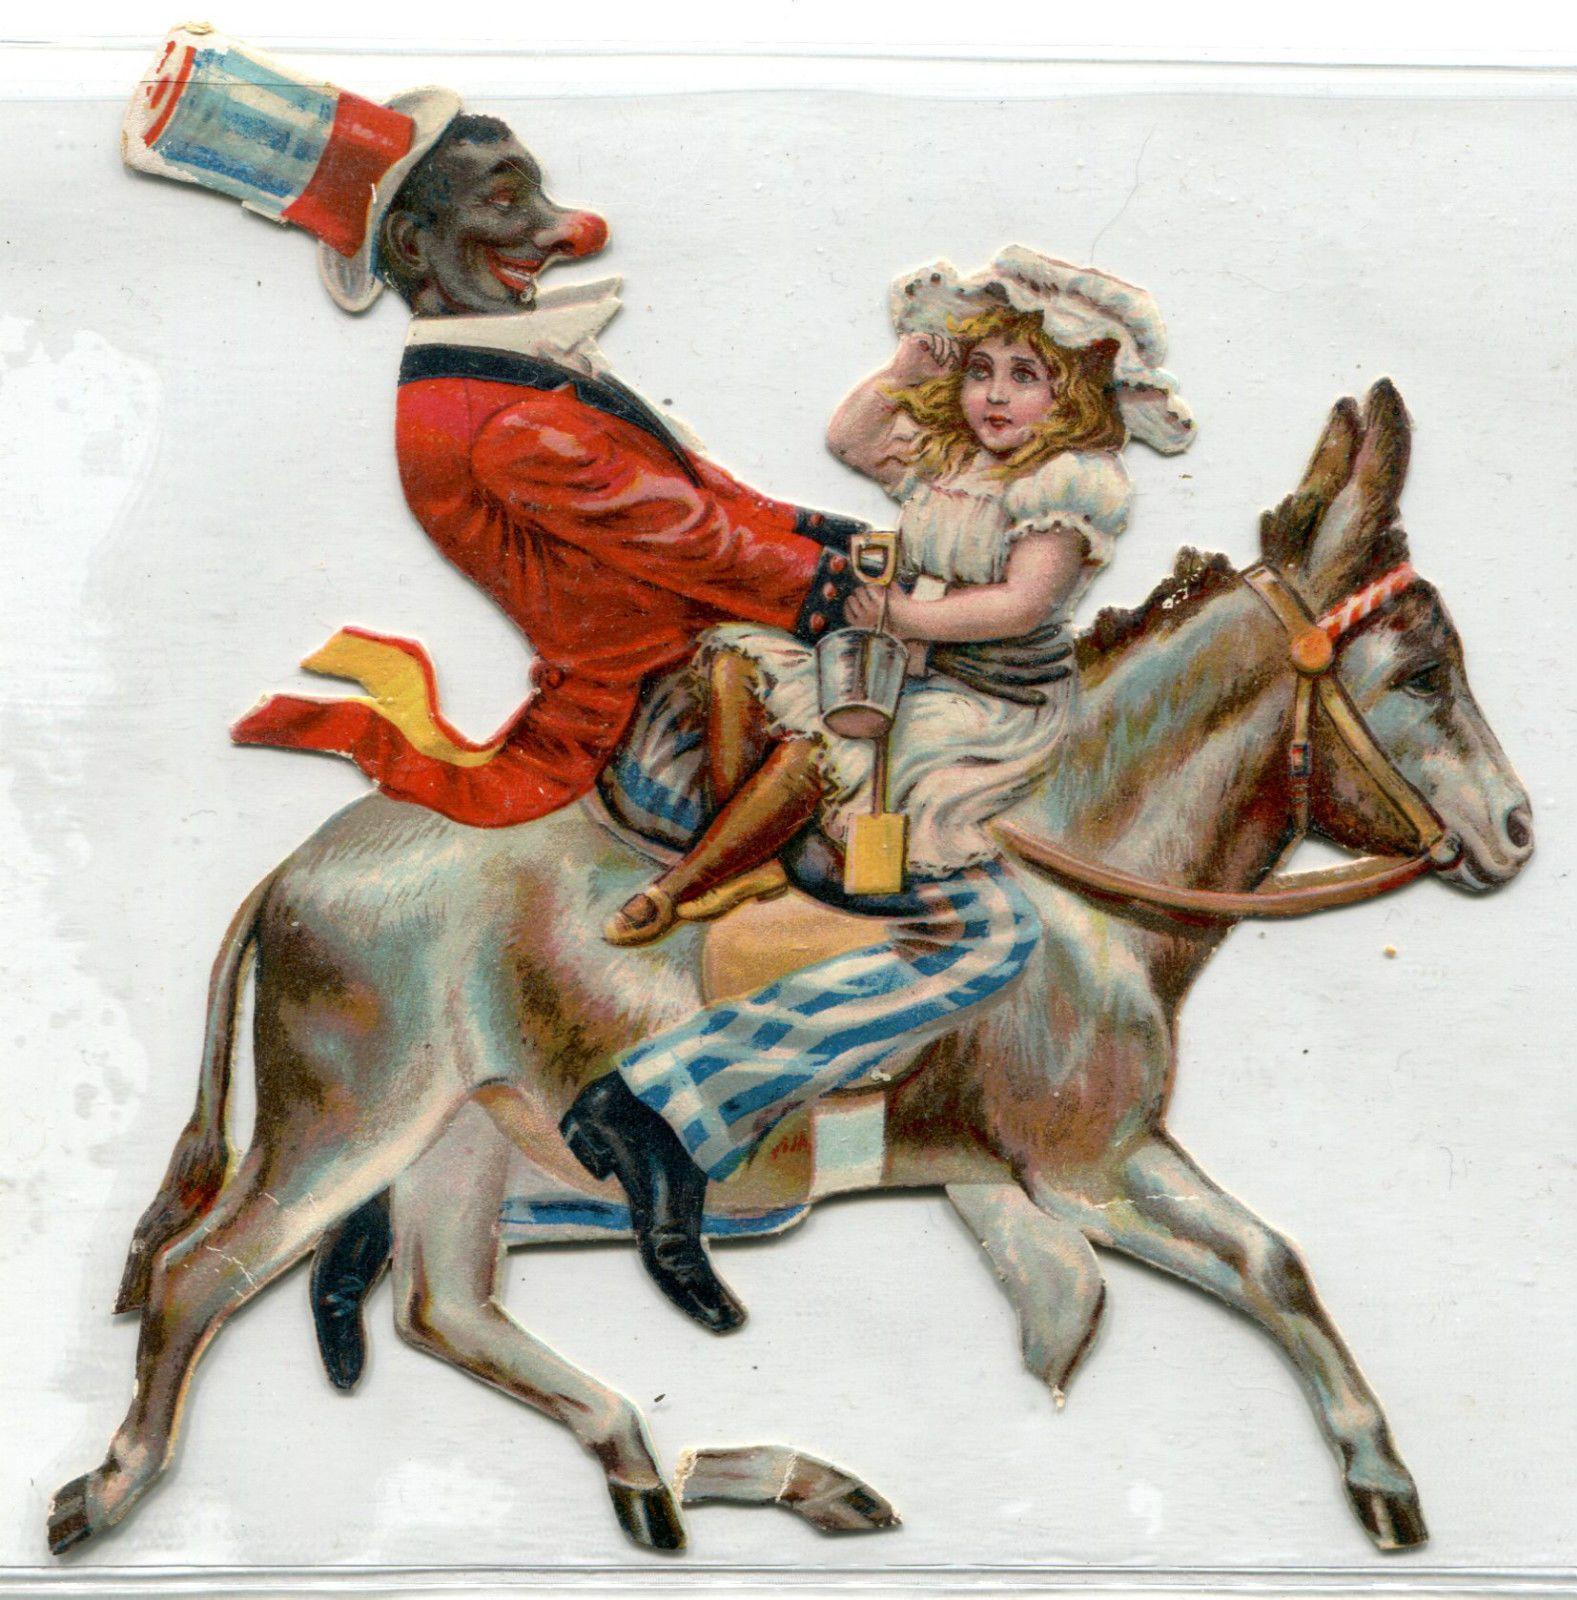 Black American Clown Riding Donkey with Child Die Cut Victorian Trade Card | eBay